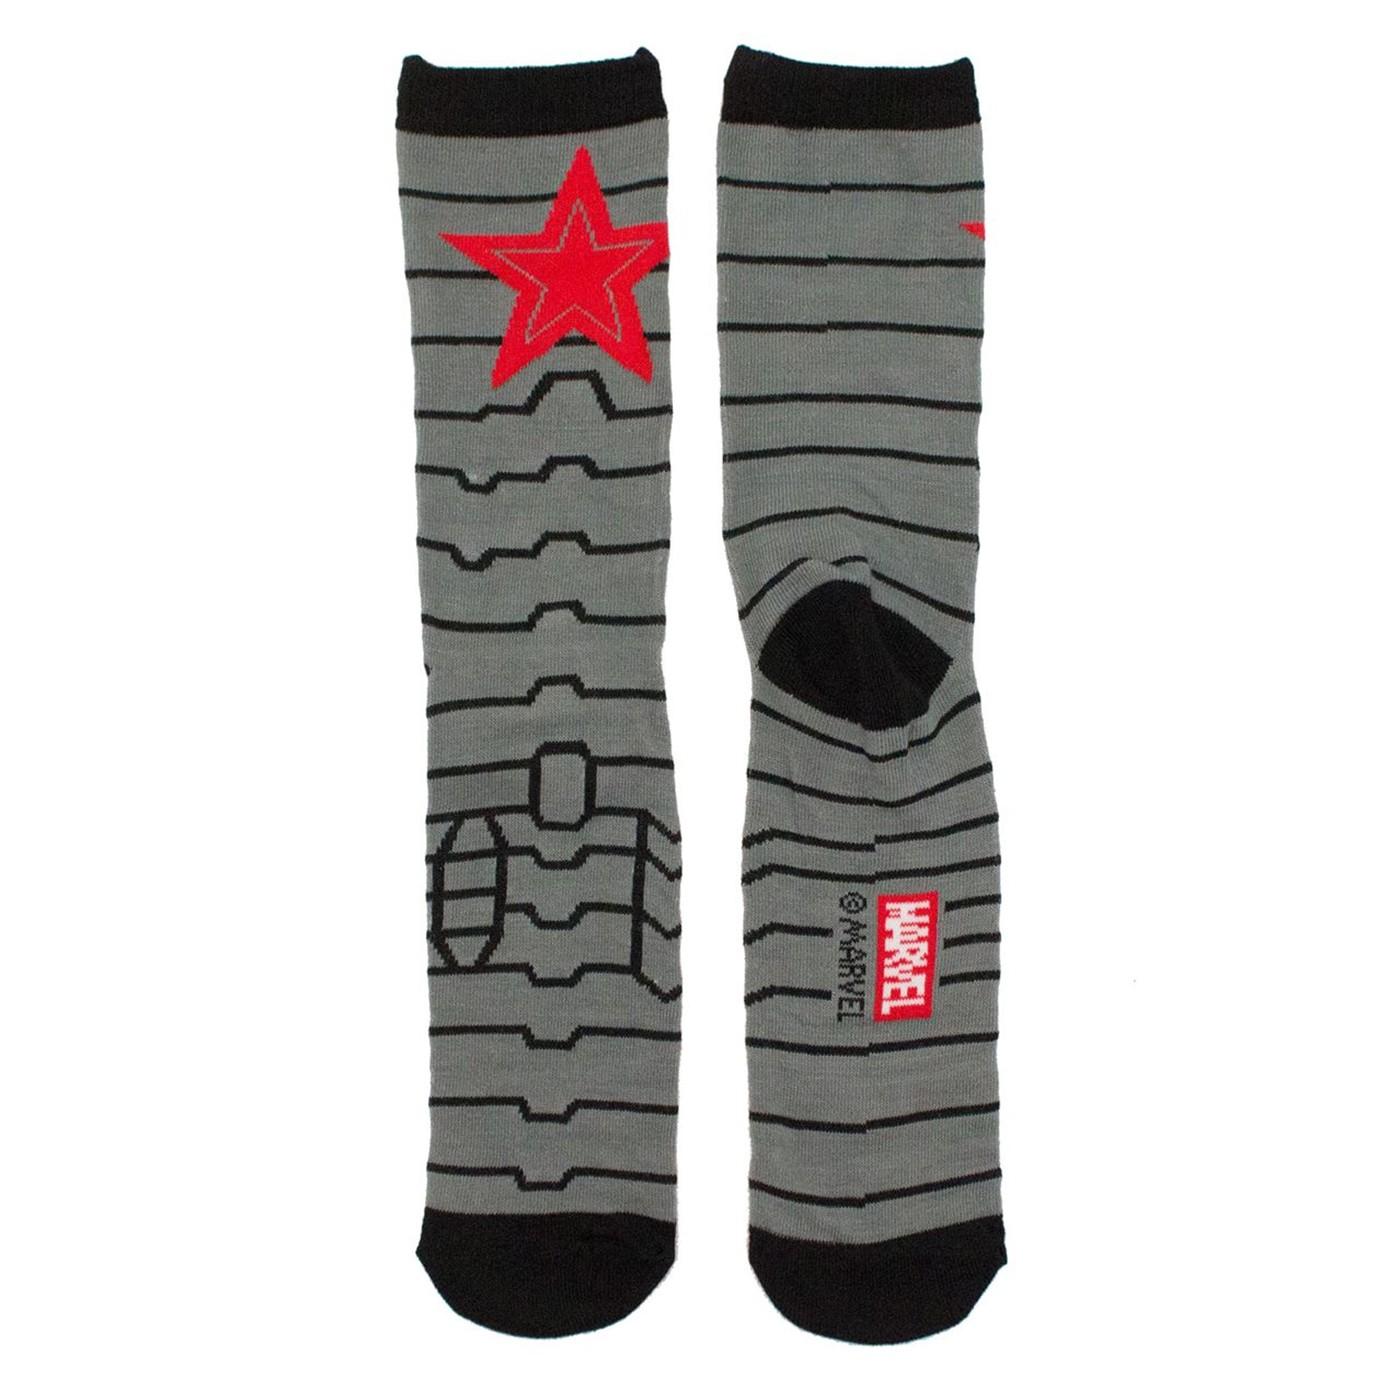 Winter Soldier Crew Socks